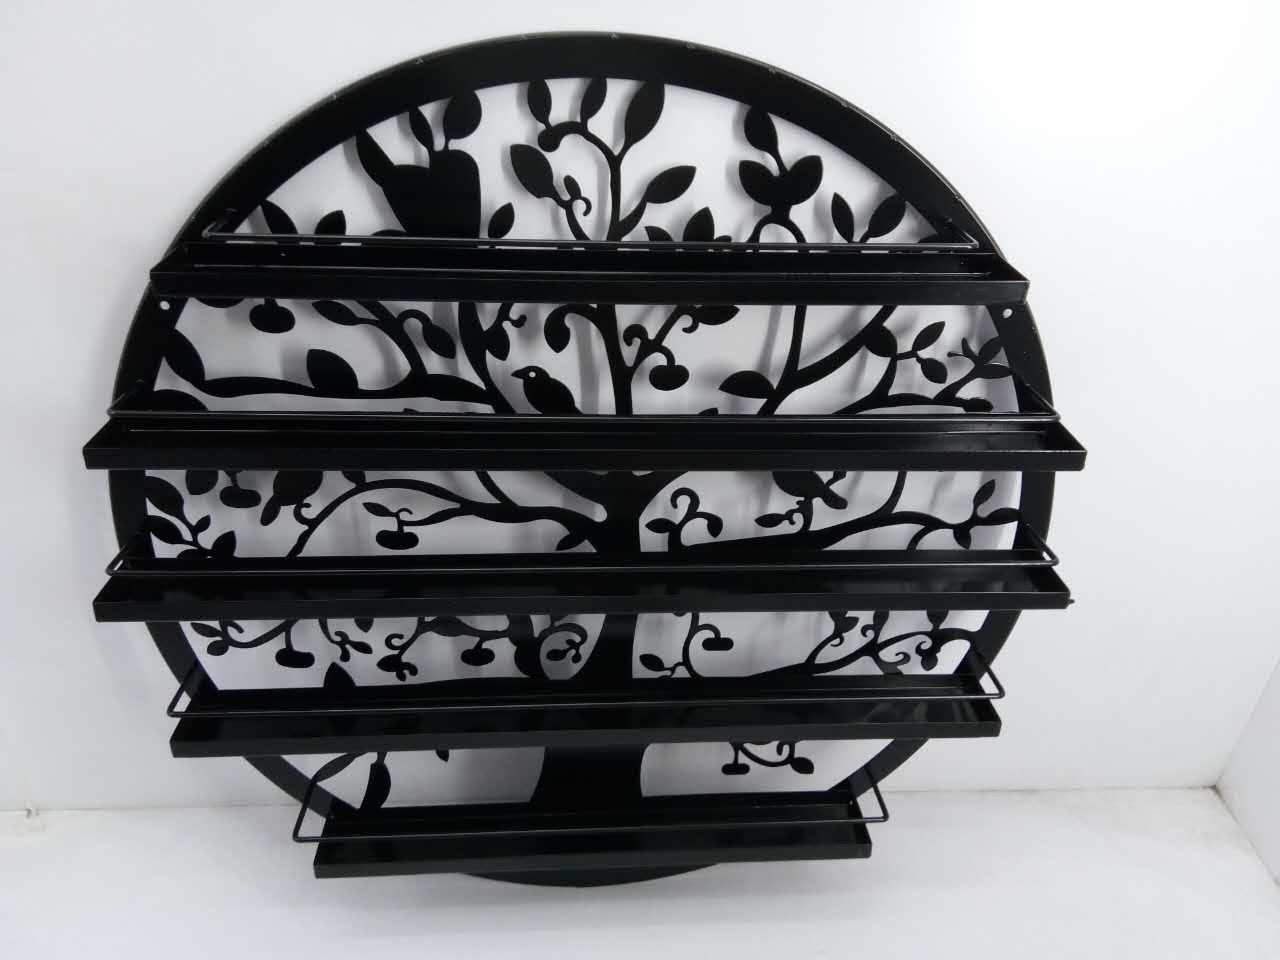 Erfreut Nagellack Wand Kanada Rack Galerie - Nagellack-Design-Ideen ...